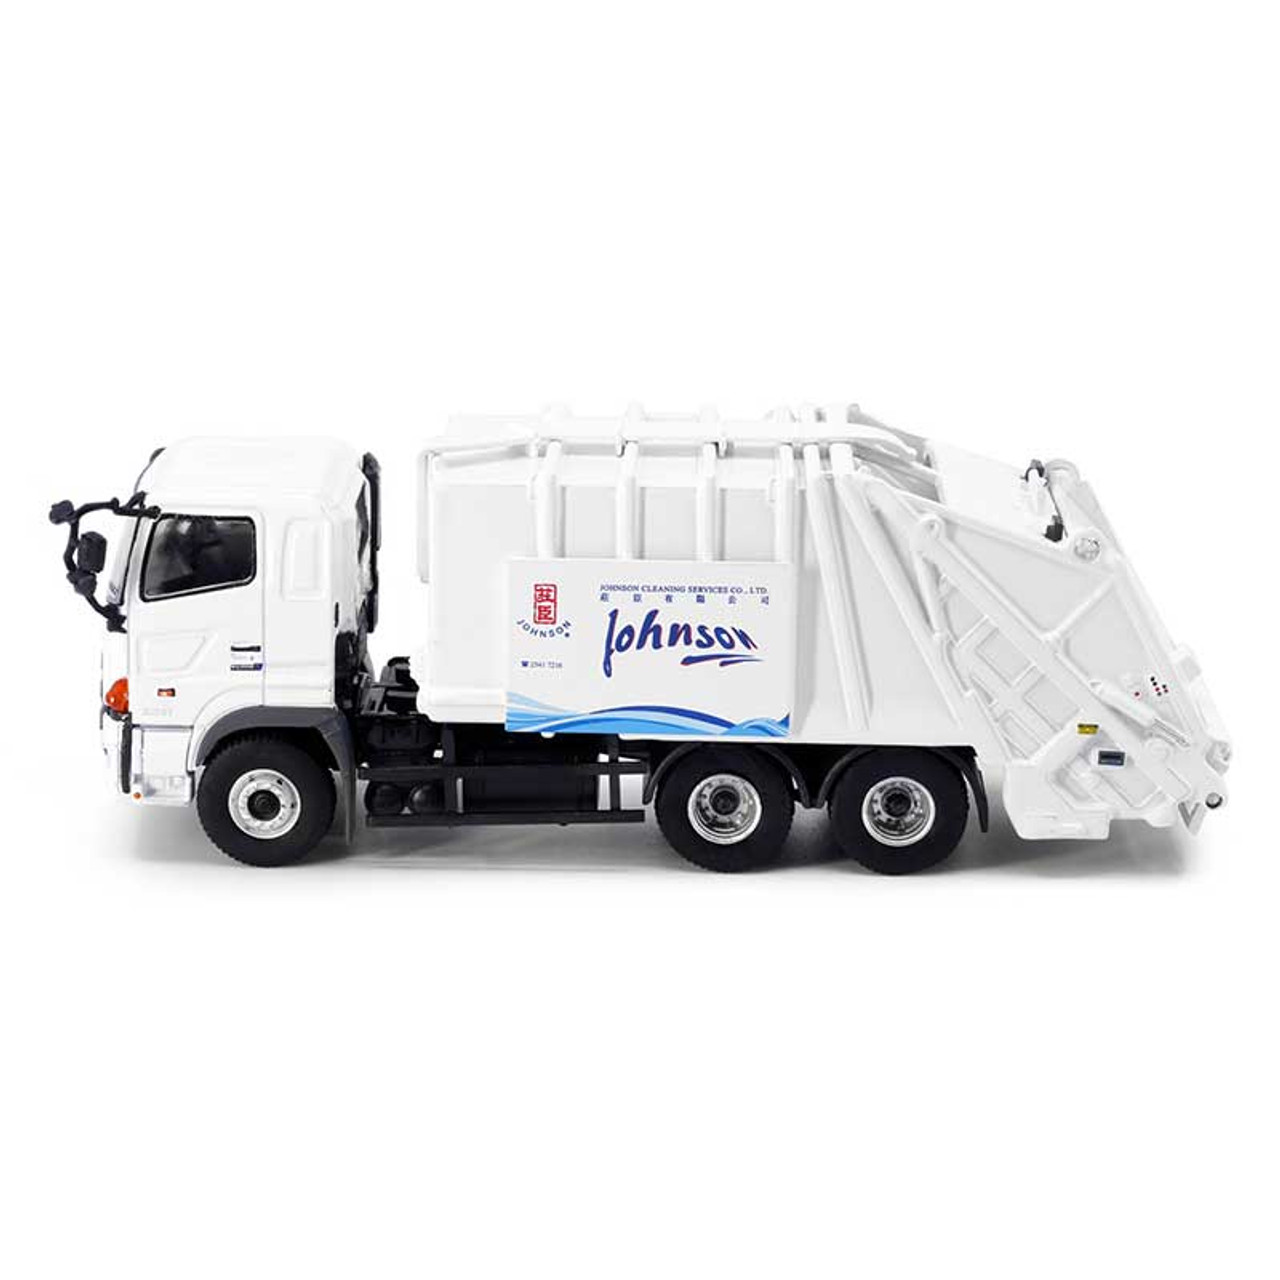 1:76 HINO 700 Refuse Truck Johnson